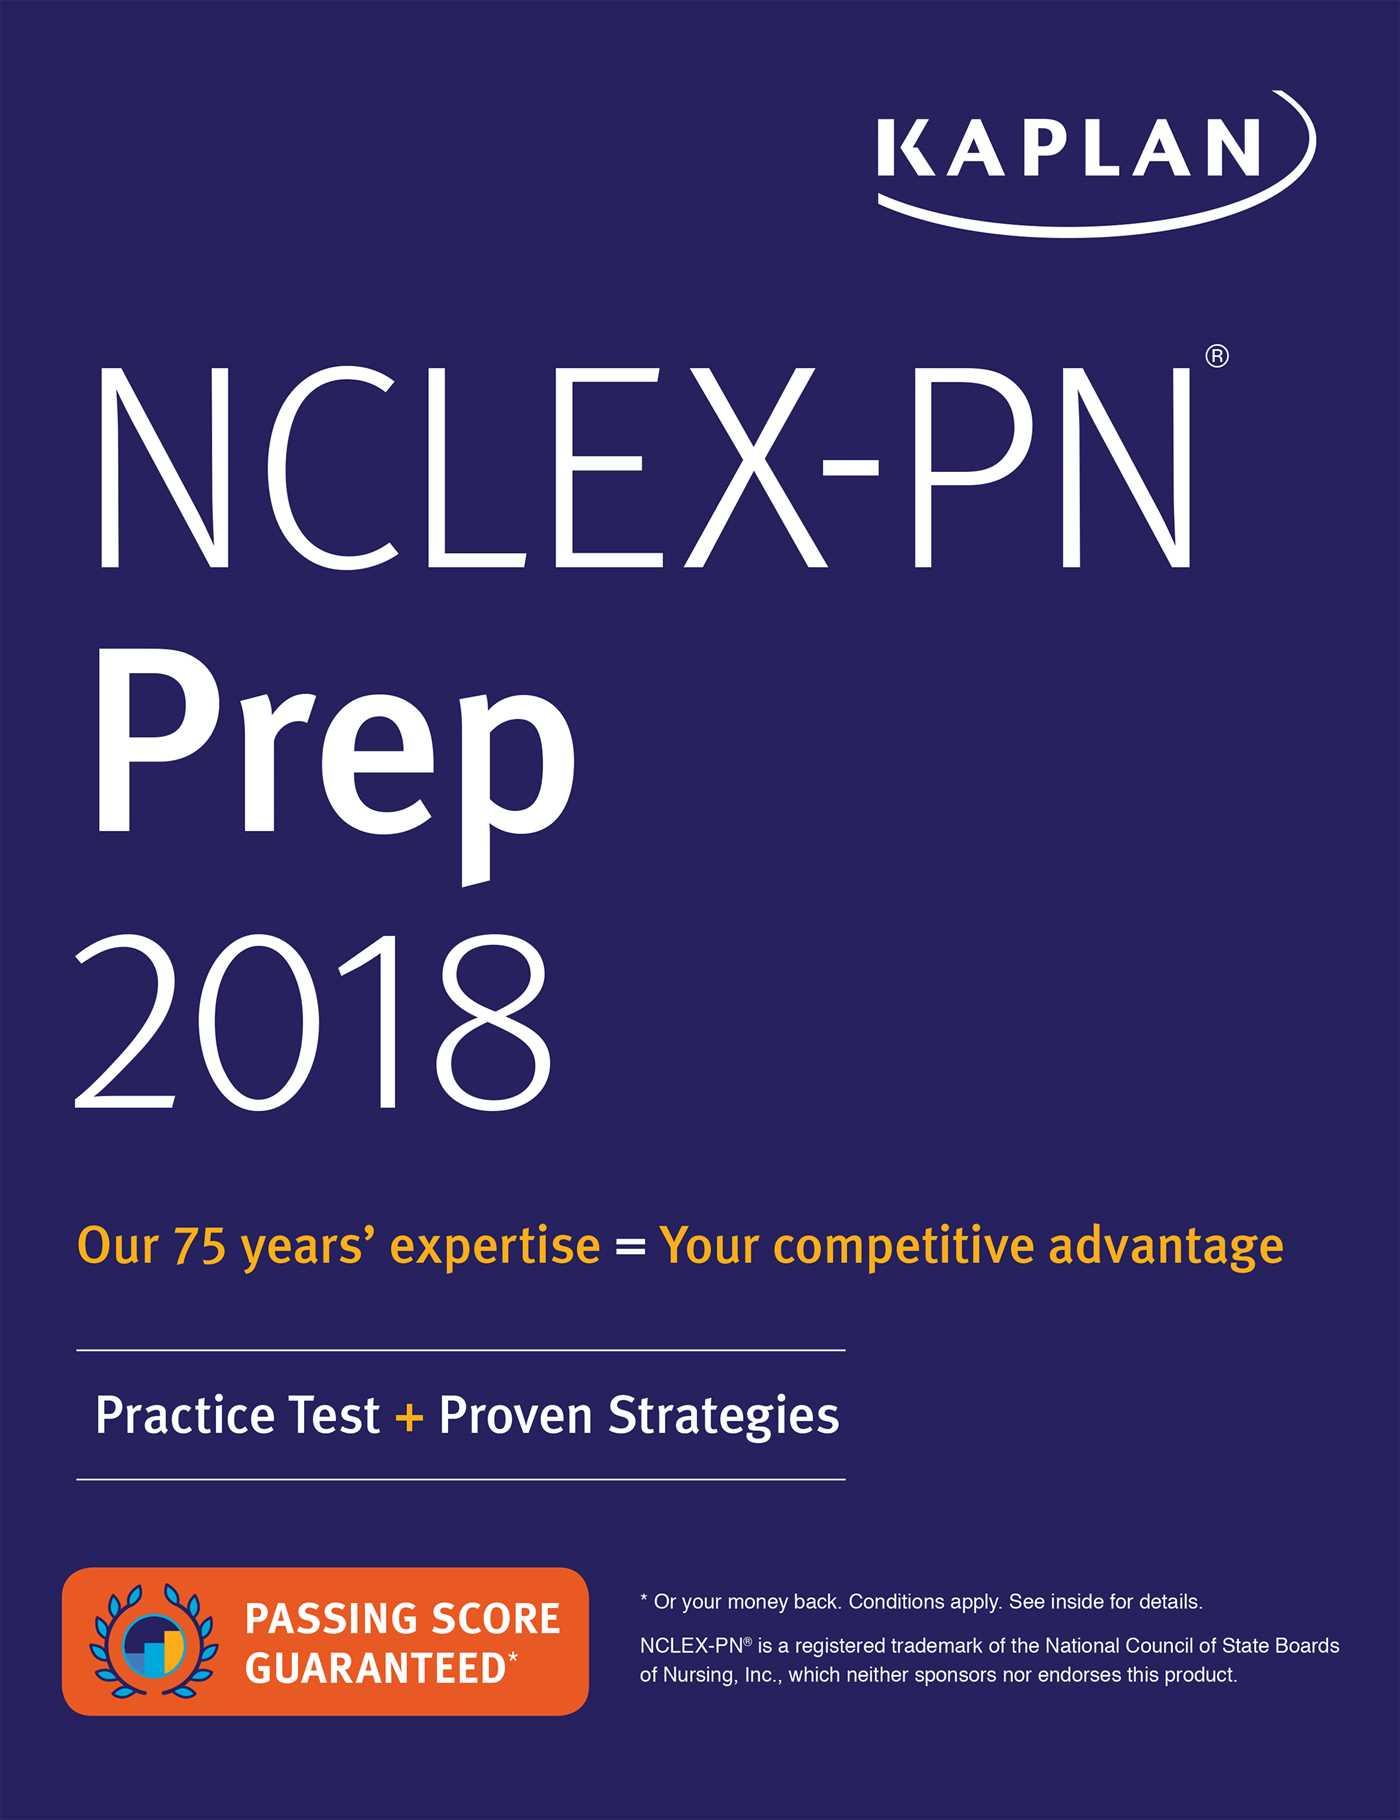 Book Cover Image (jpg): NCLEX-PN Prep 2018